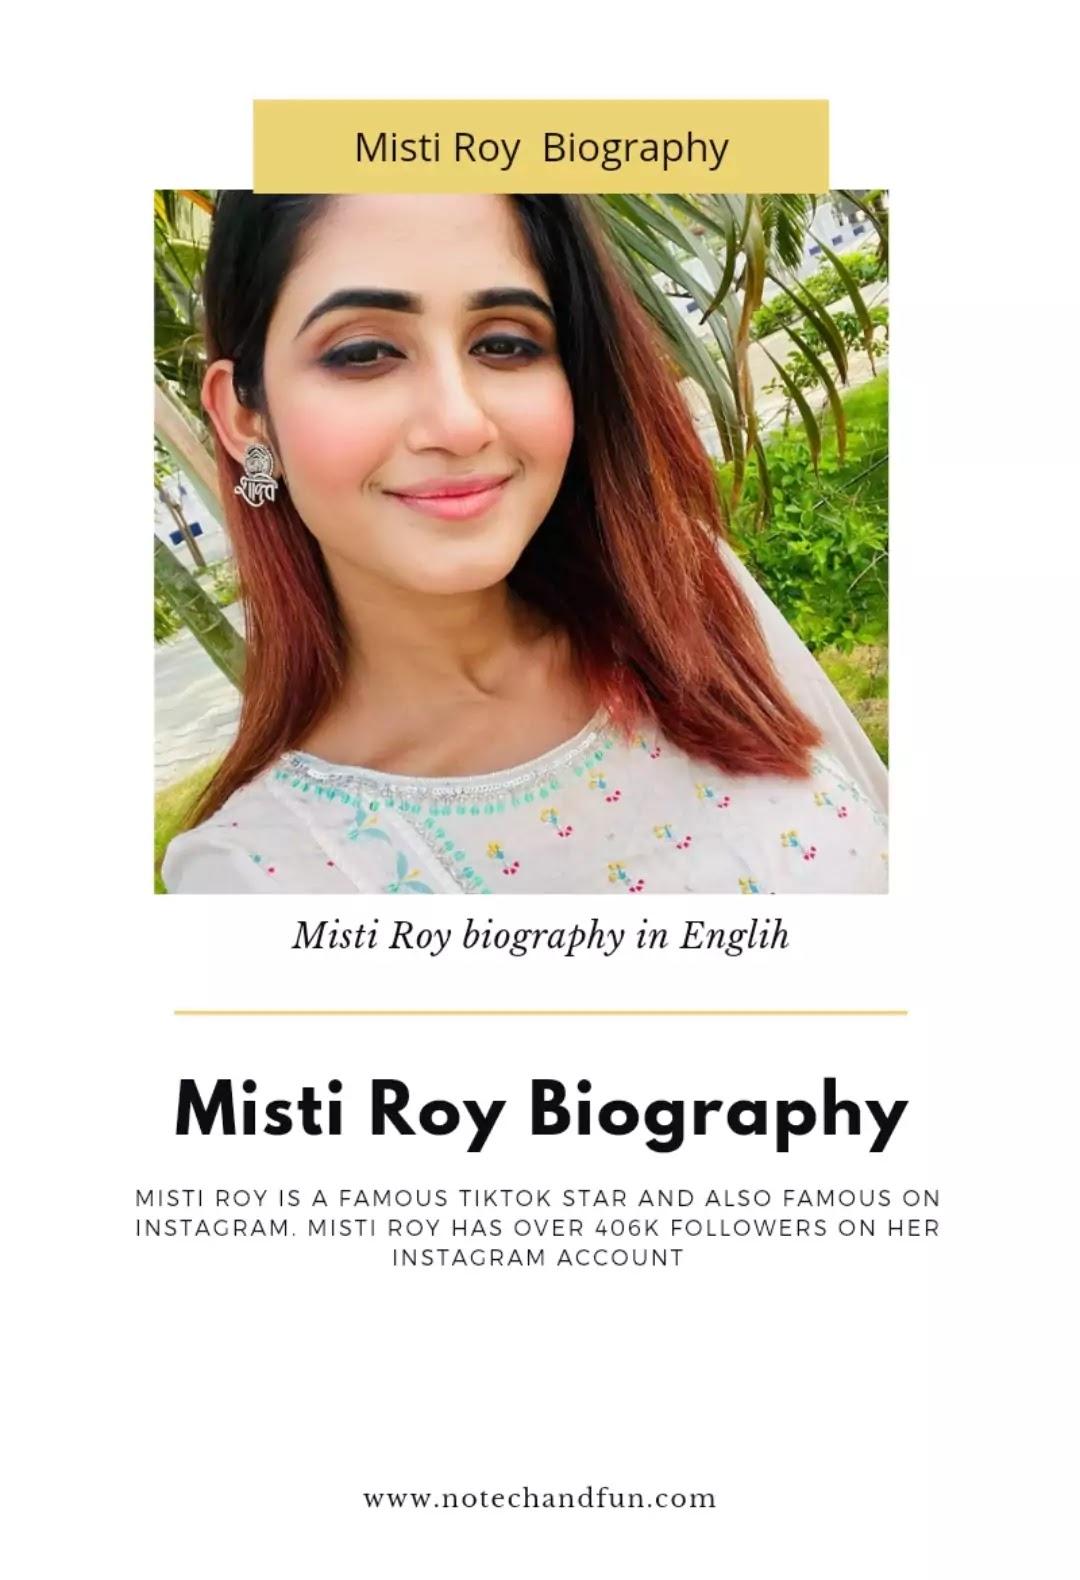 Misti Roy biography